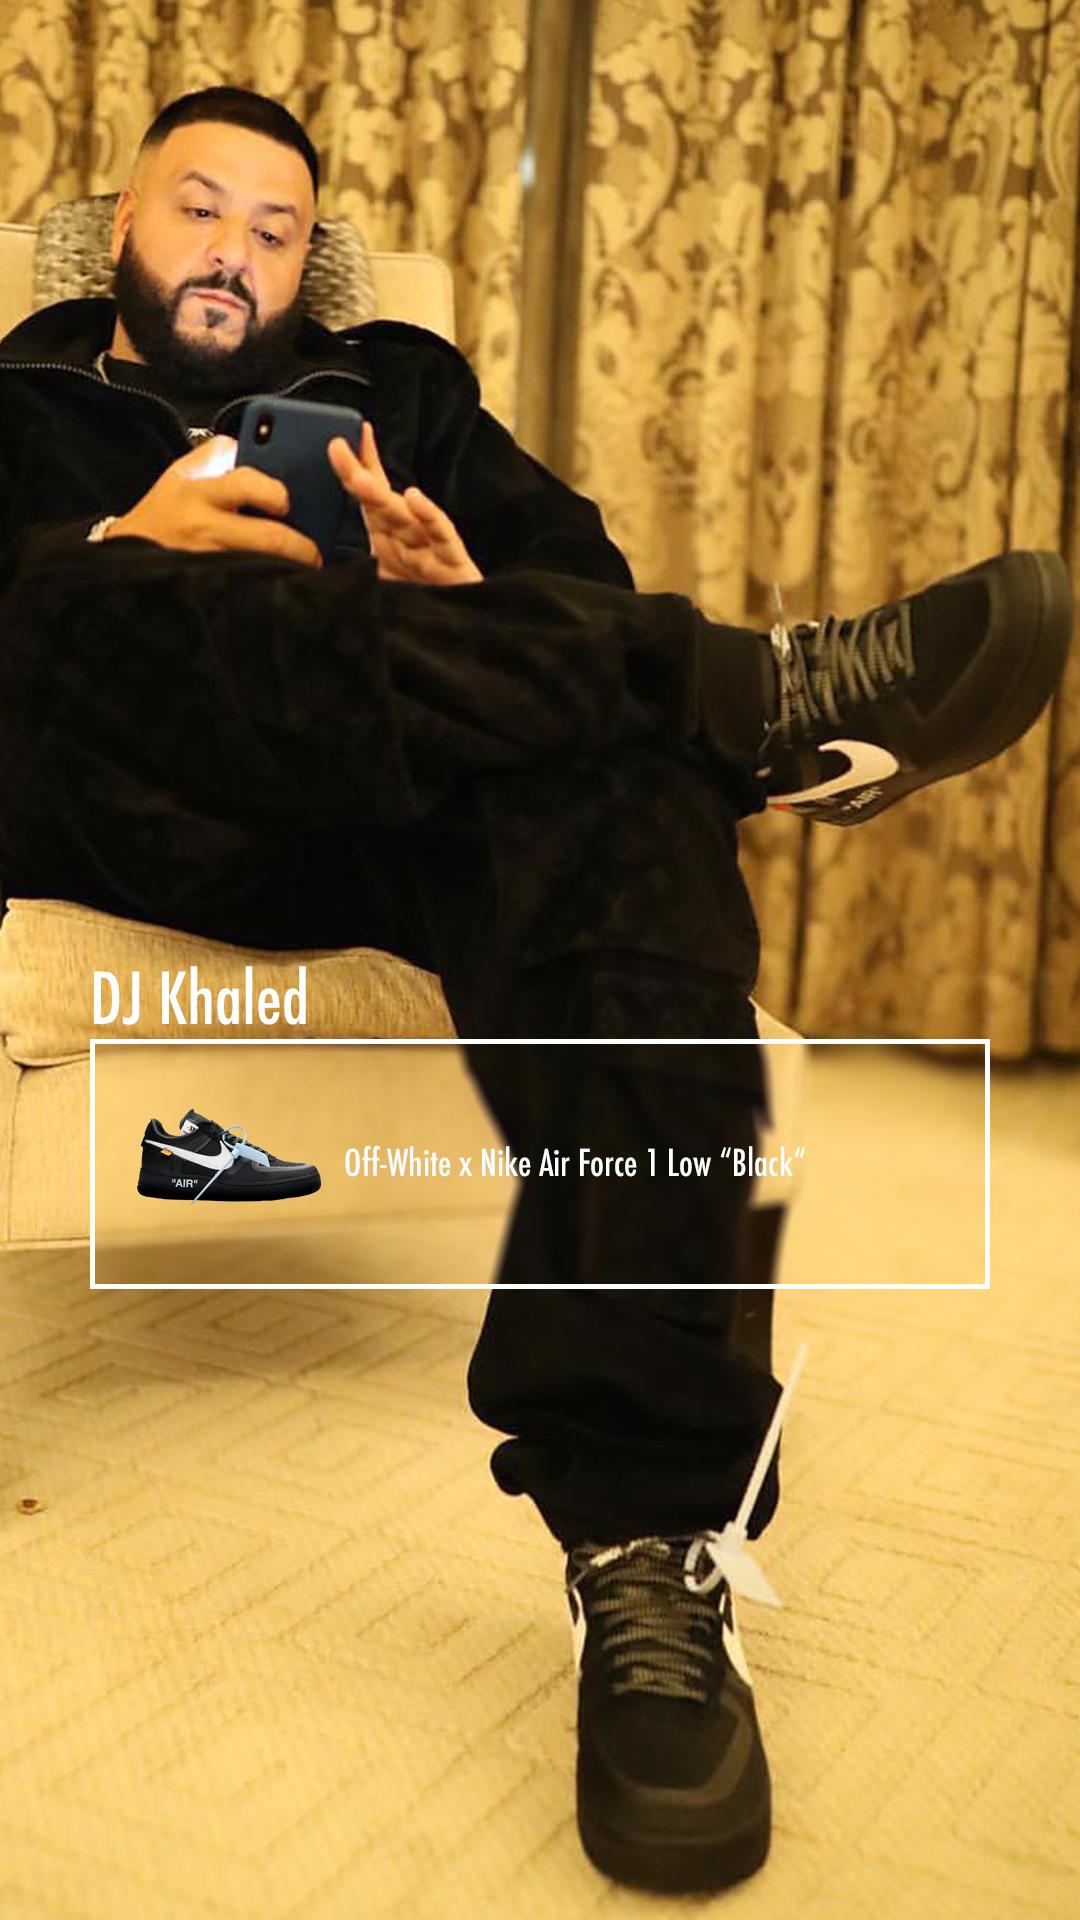 DJ Khaled: Off-White x Nike Air Force 1